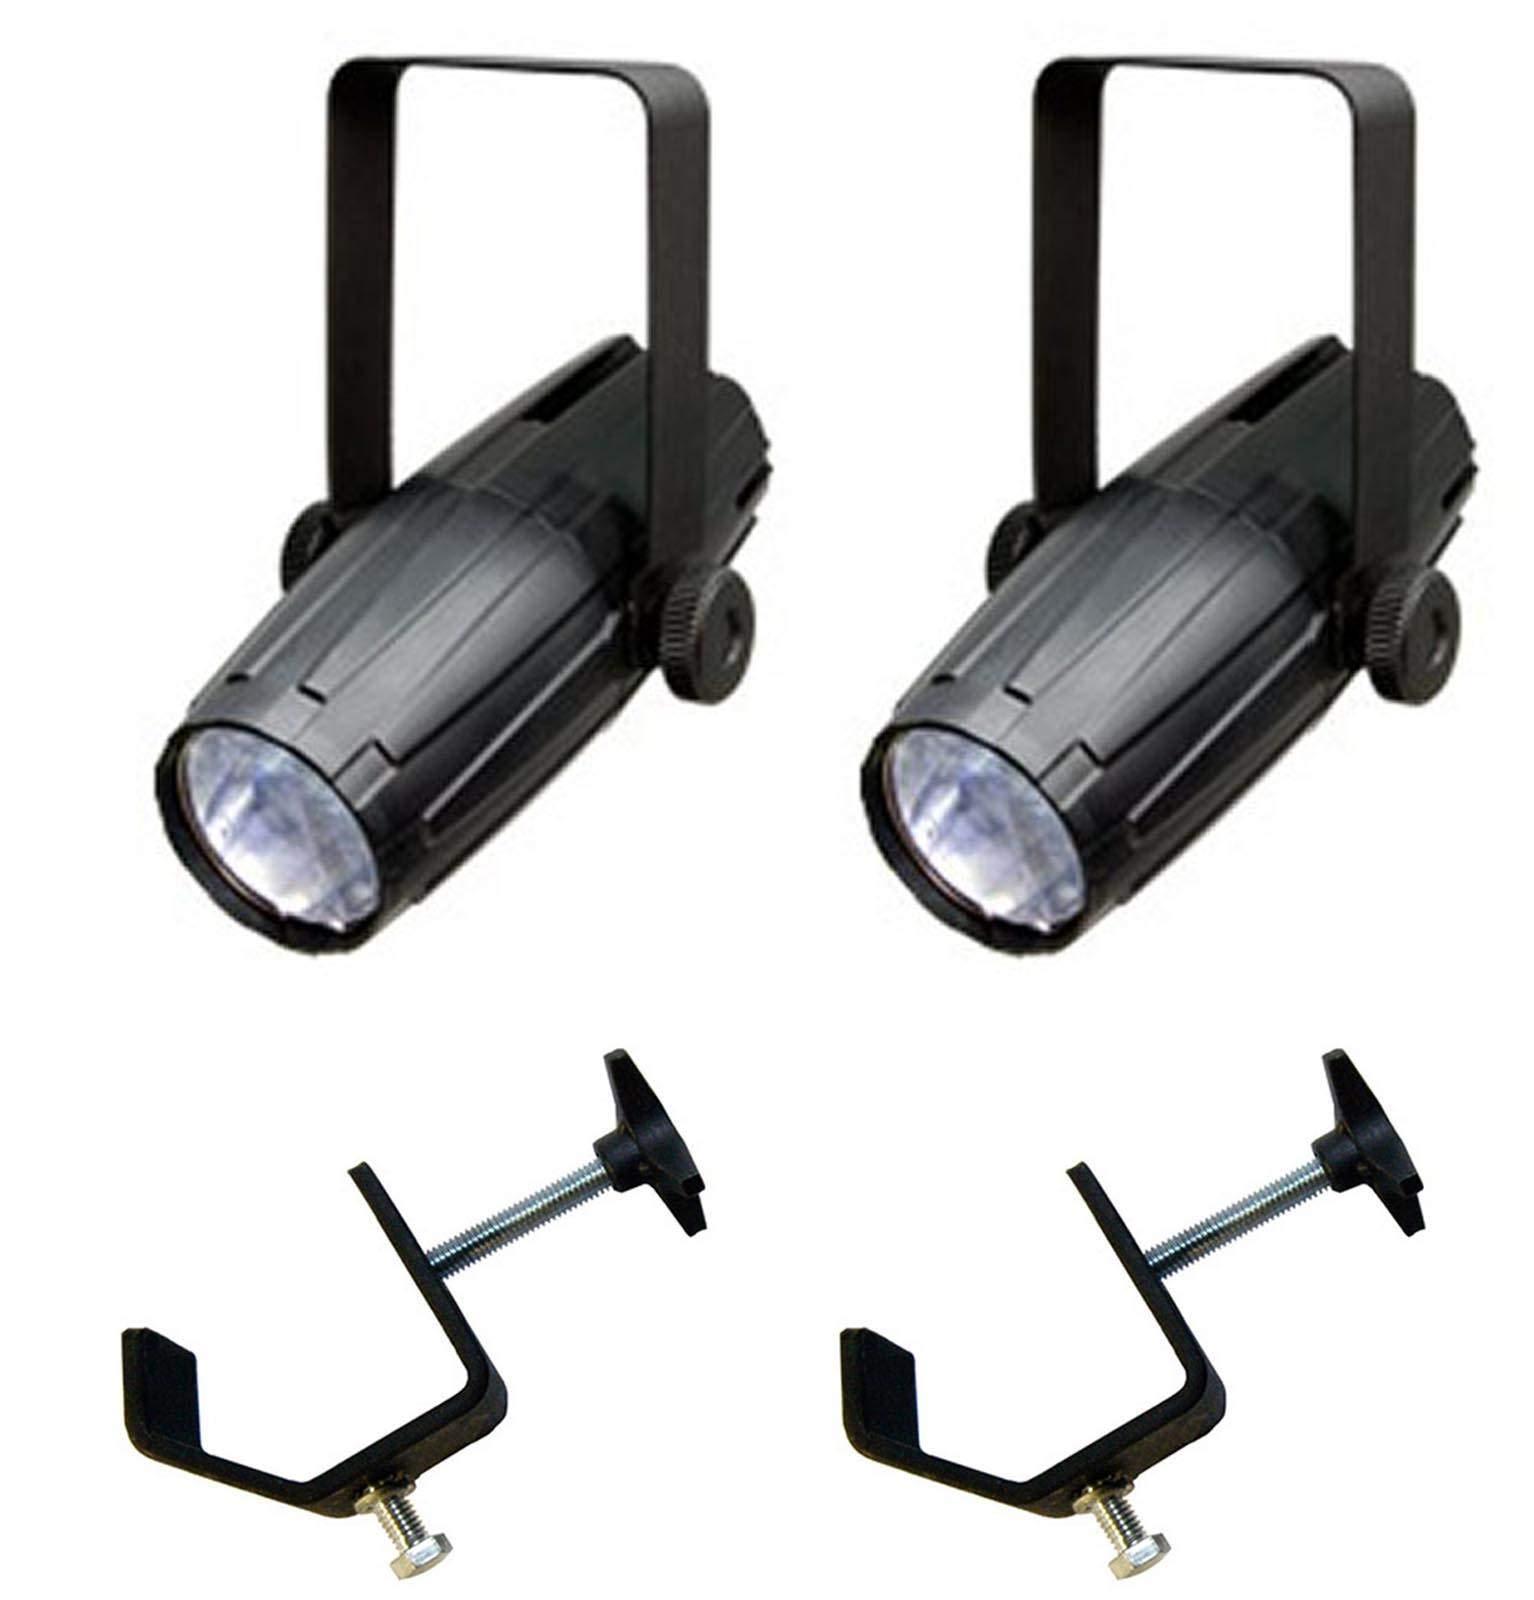 (2) CHAUVET LED PINSPOT 2 High-Powered 3W DJ Mirror Ball Spotlights w/ C-Clamps by CHAUVET DJ